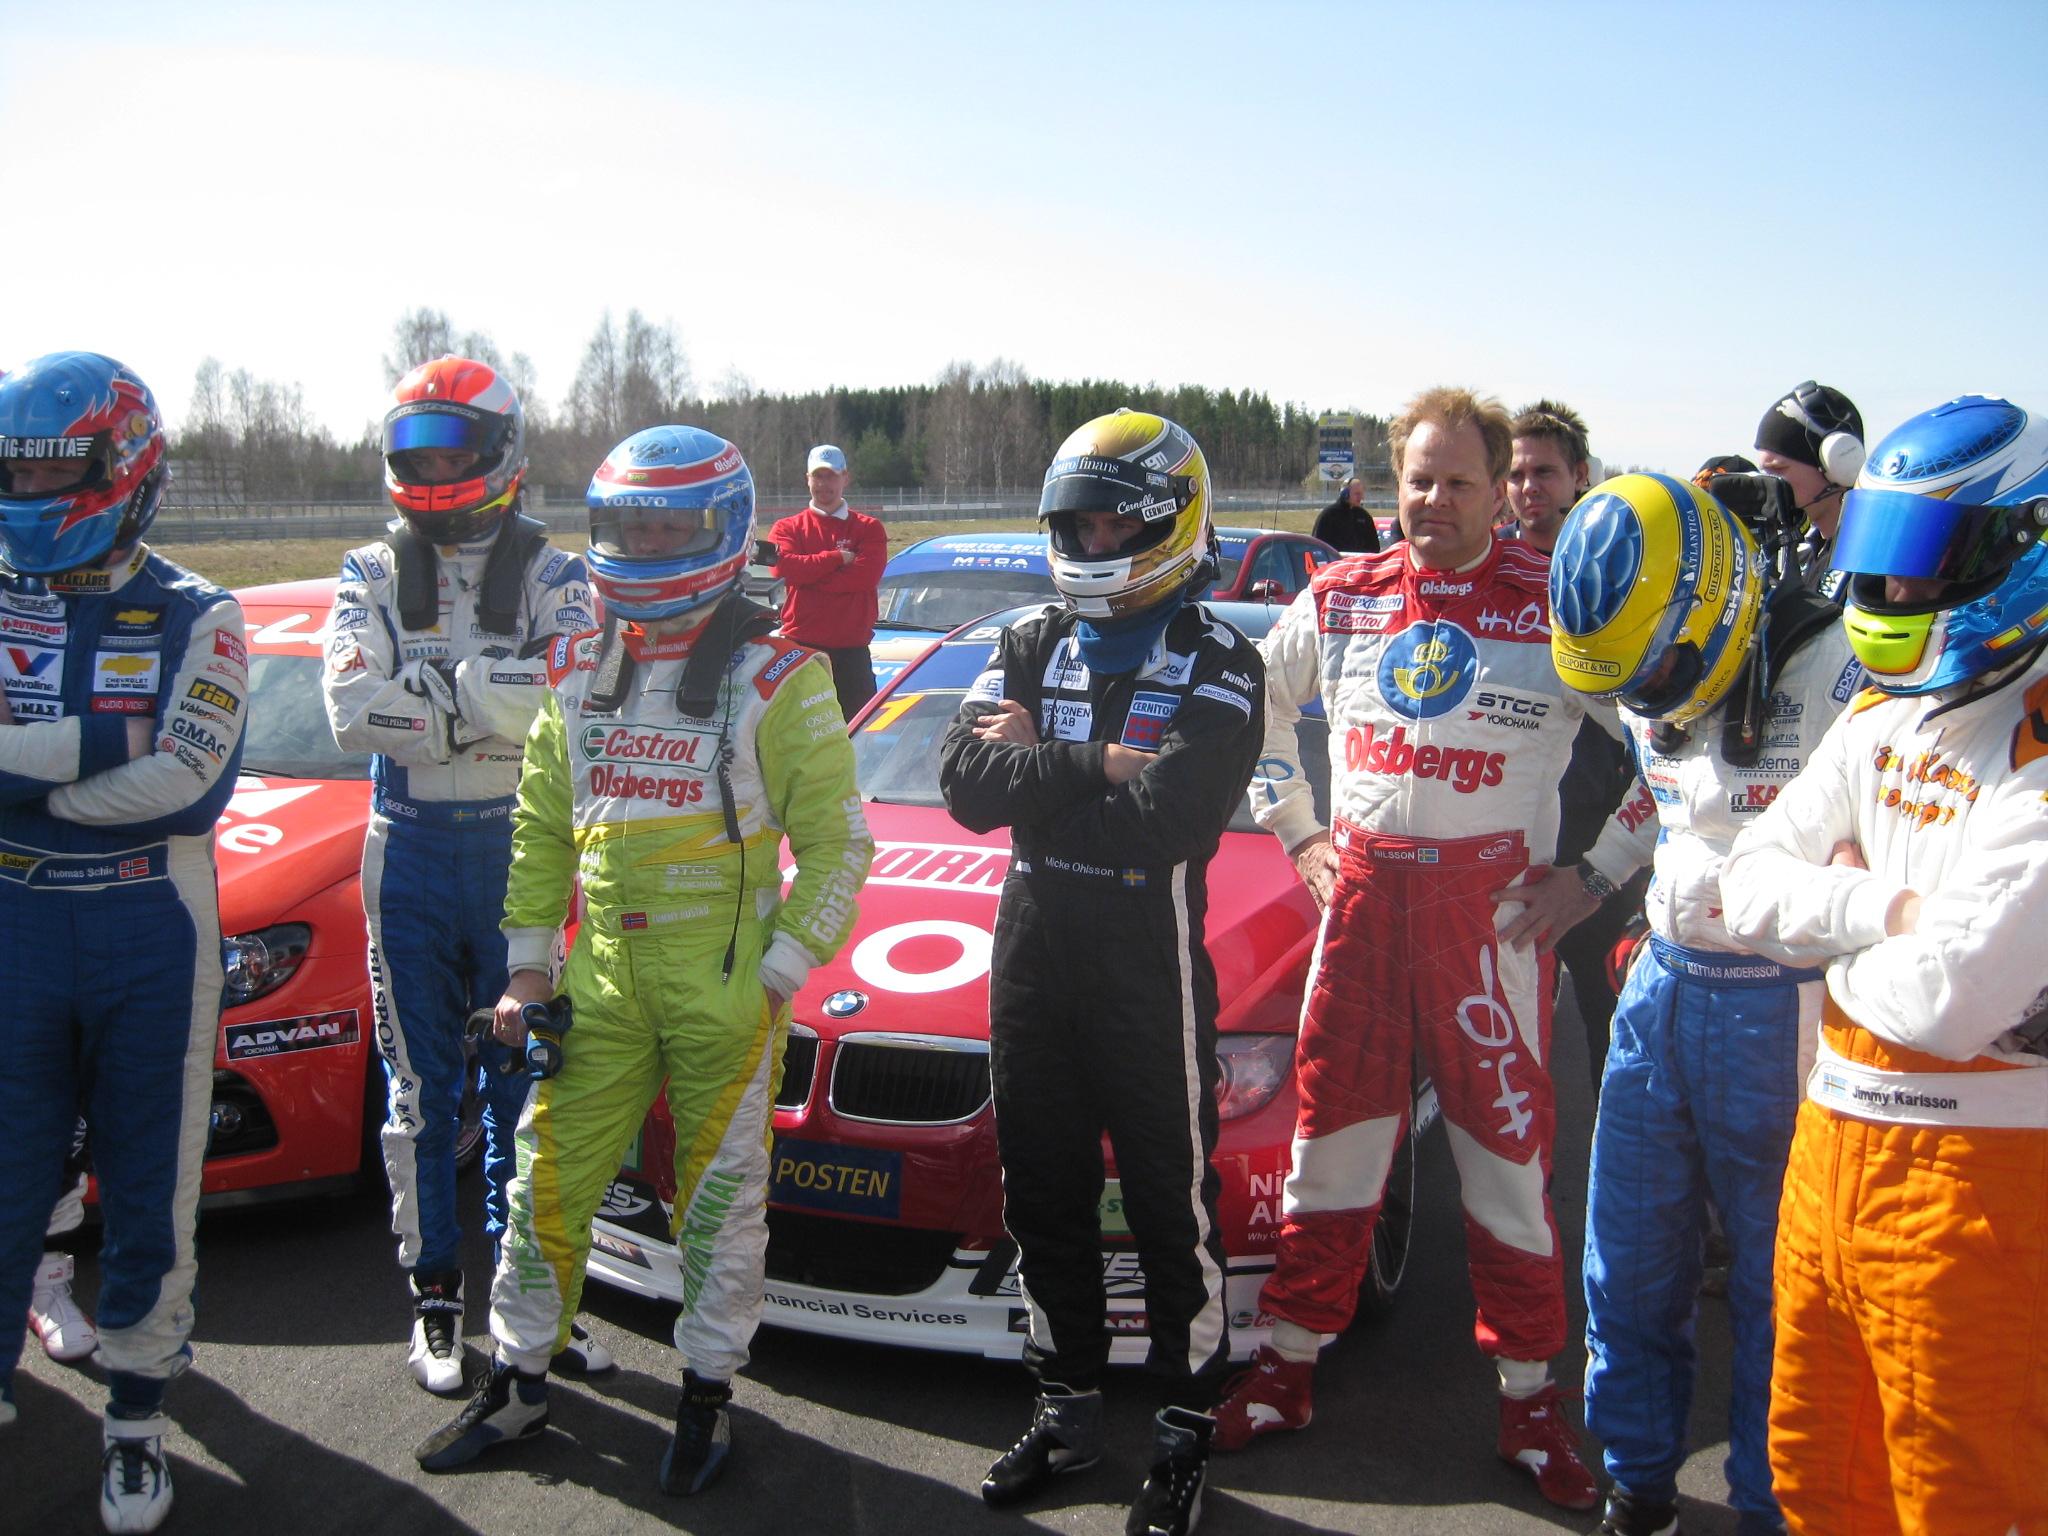 Racingkriget - del 3 om Flash Engineering efter tiden med Volvo